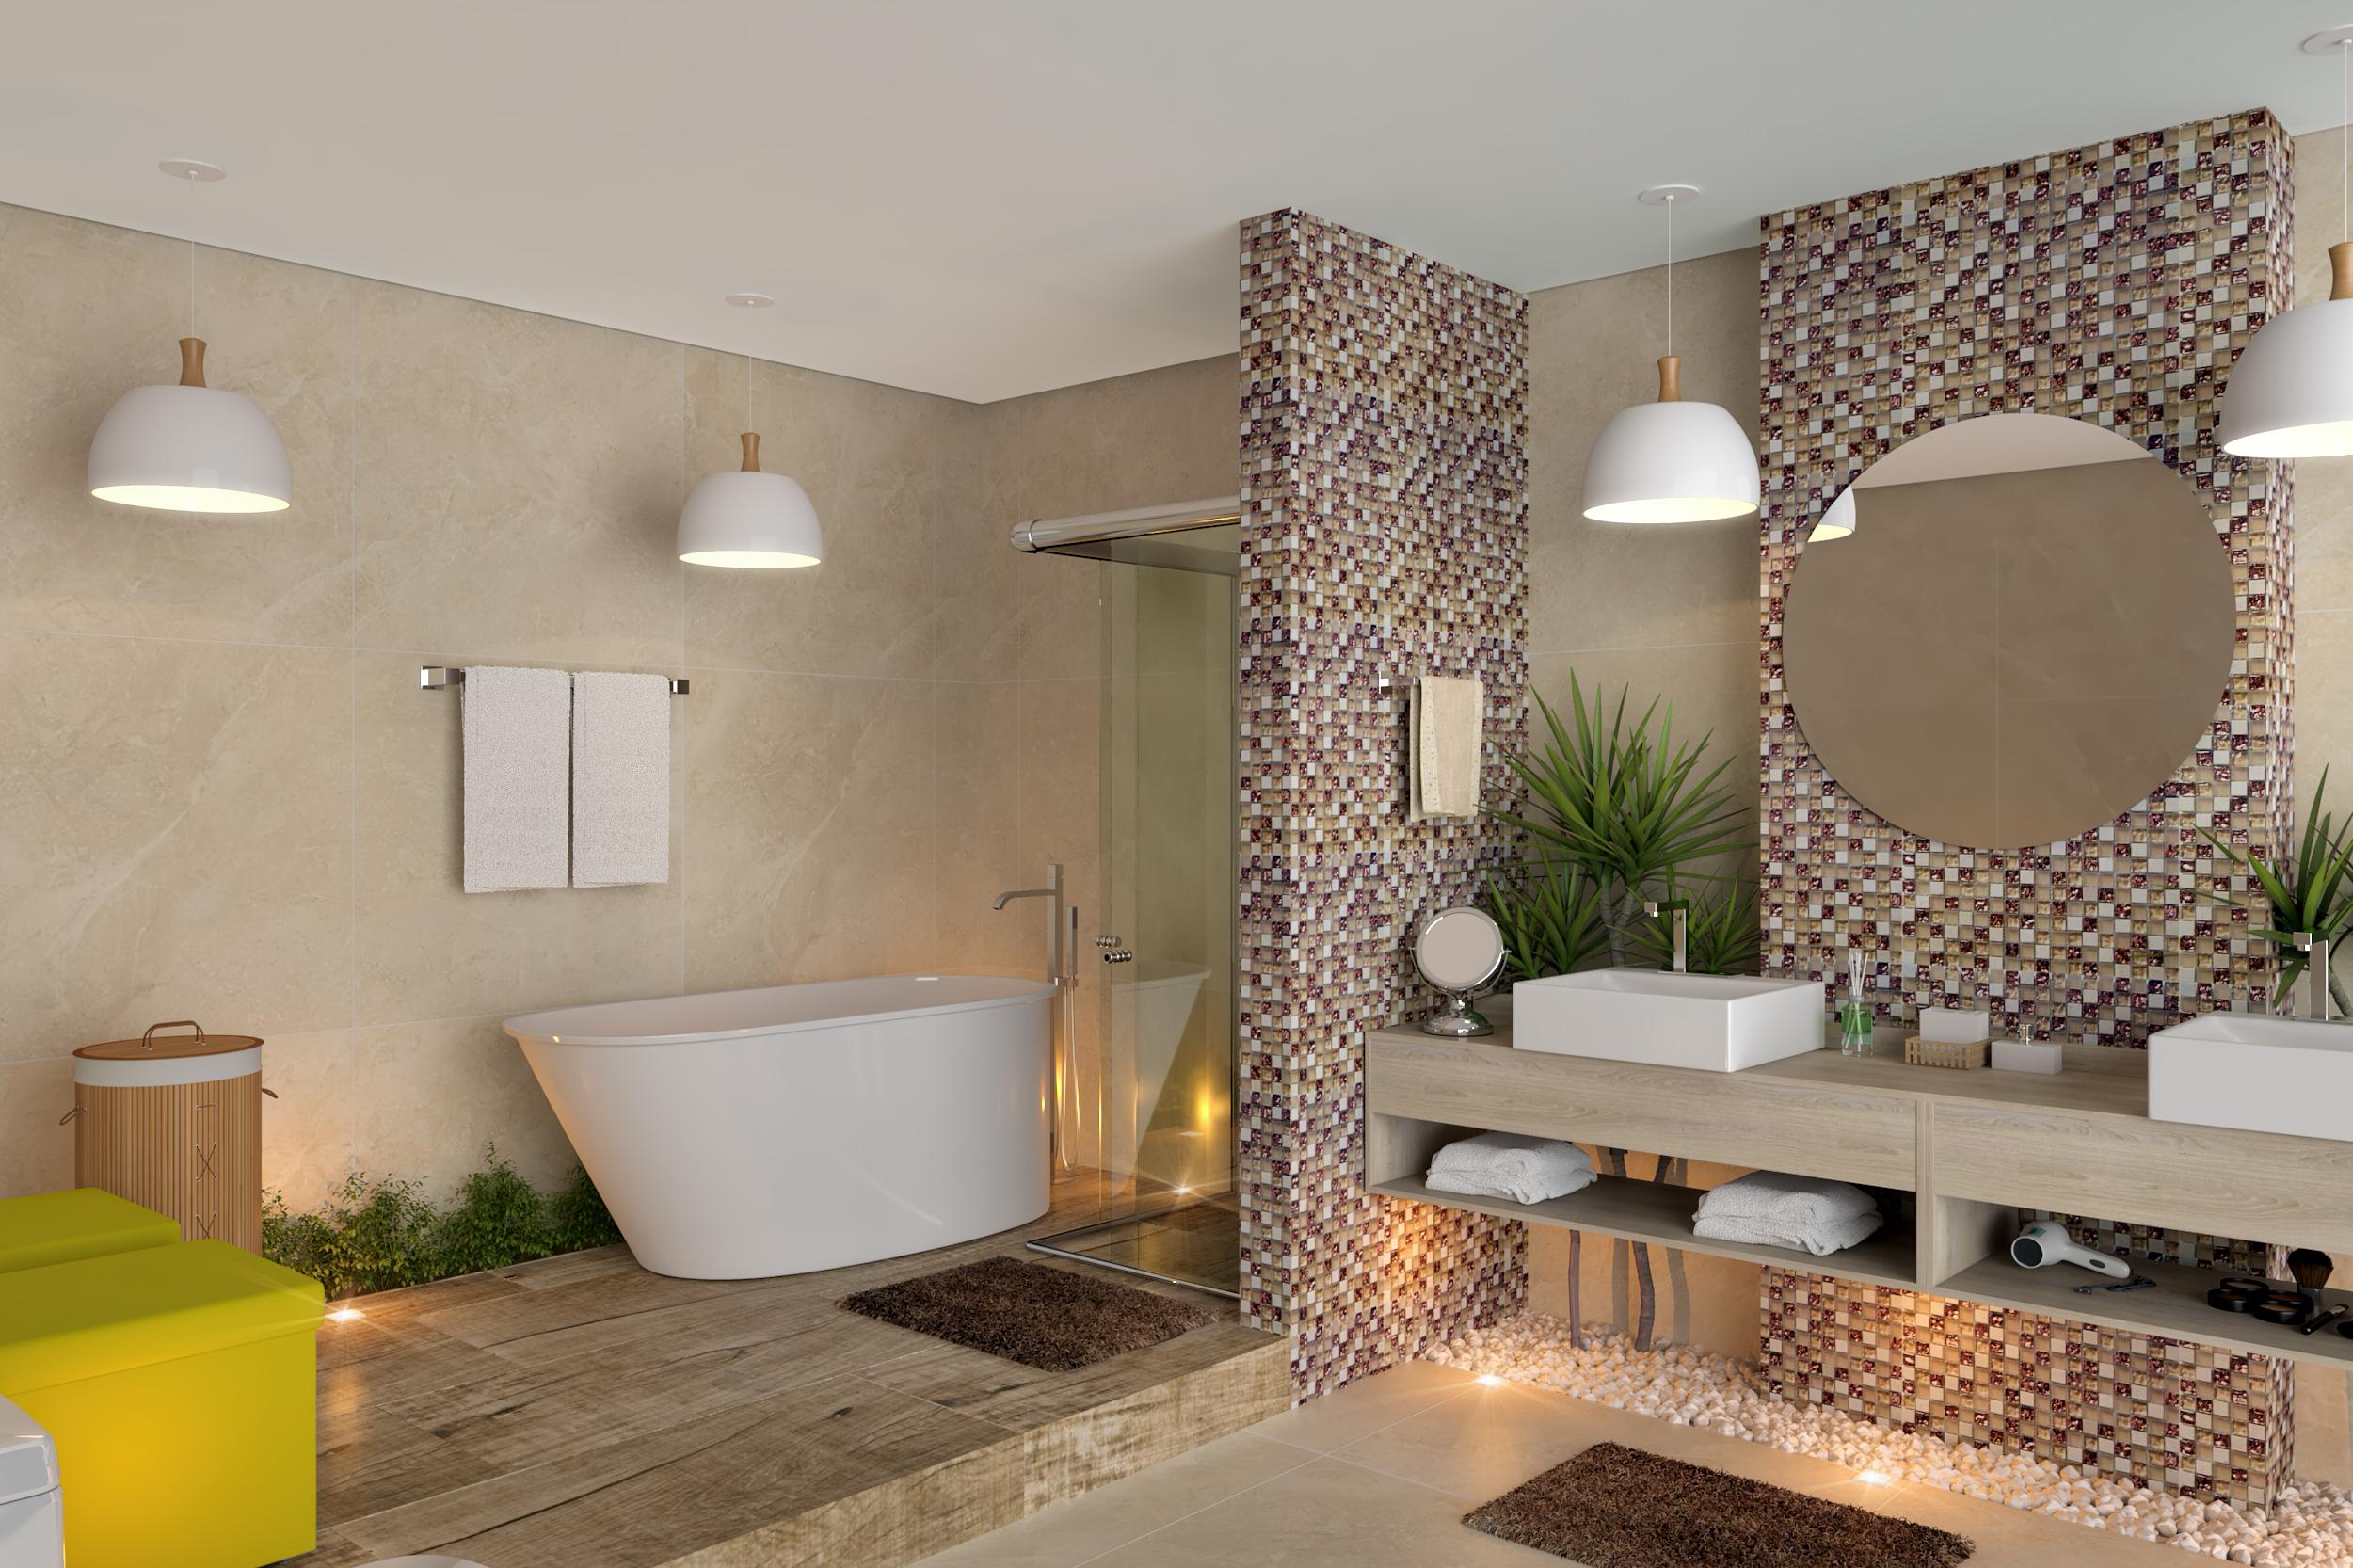 Banheiro grande e moderno - Piso pequeno moderno ...